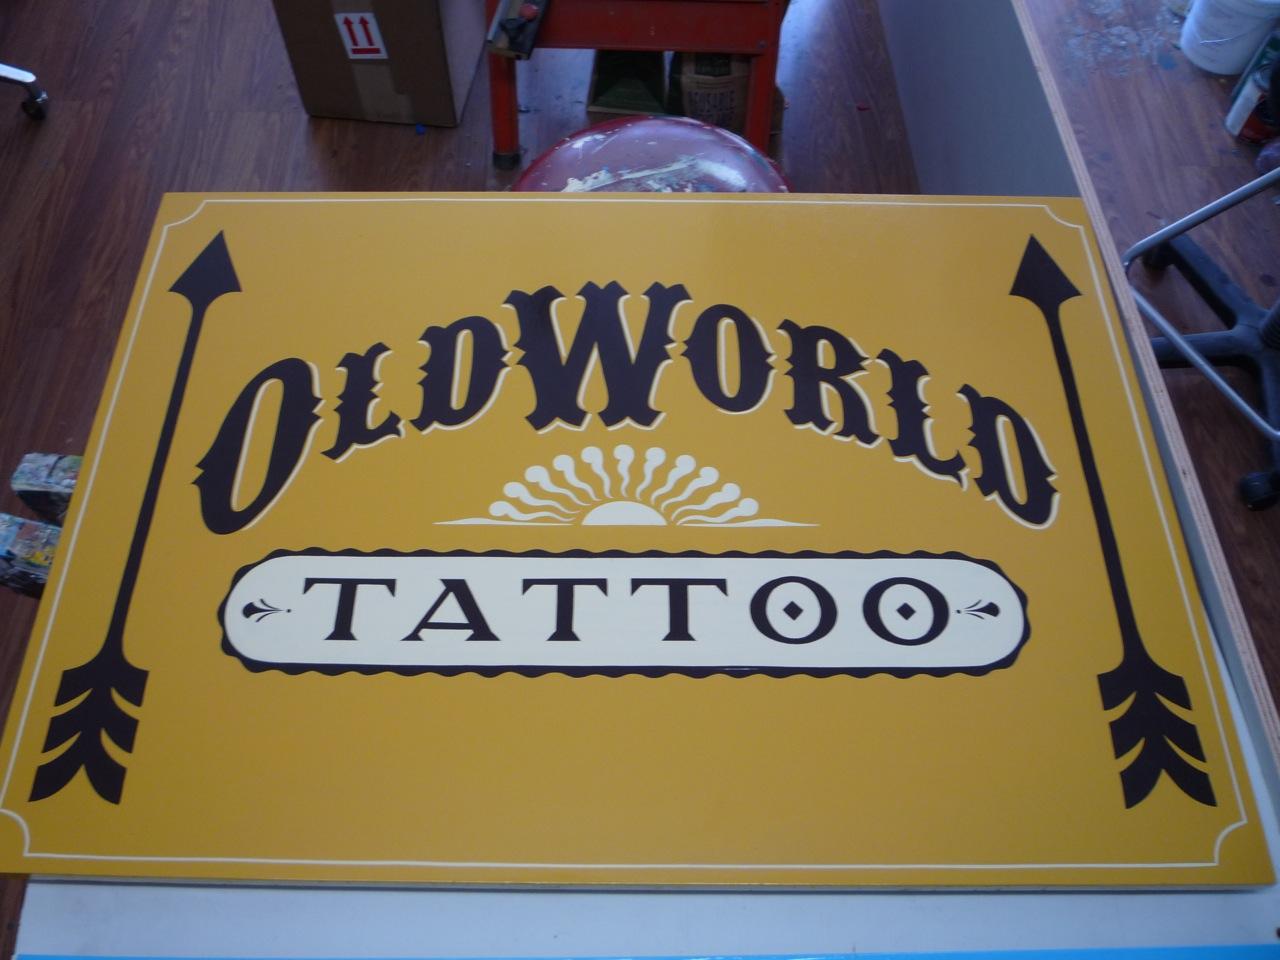 ORIG-old-world-tattoo-simple_4844776020_o.jpg